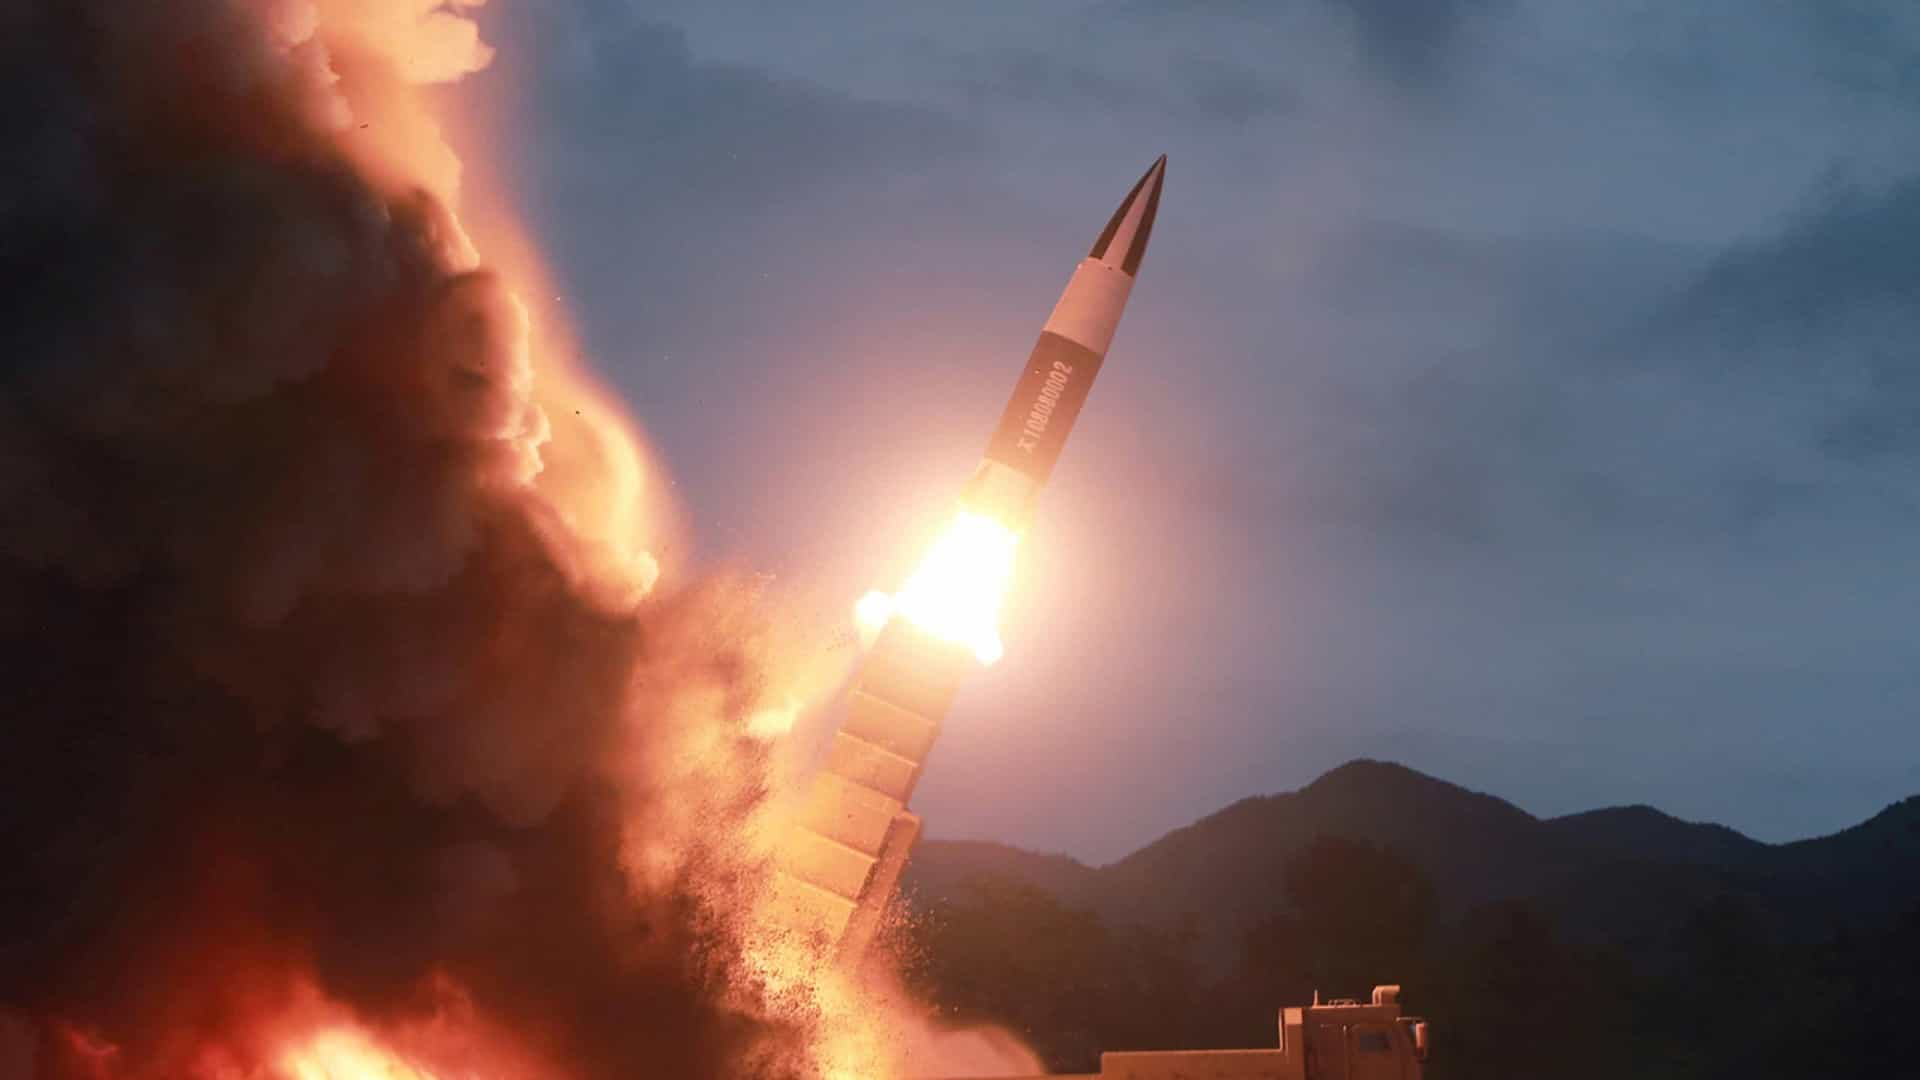 Países insistem que Irã cumpra acordo nuclear de 2015